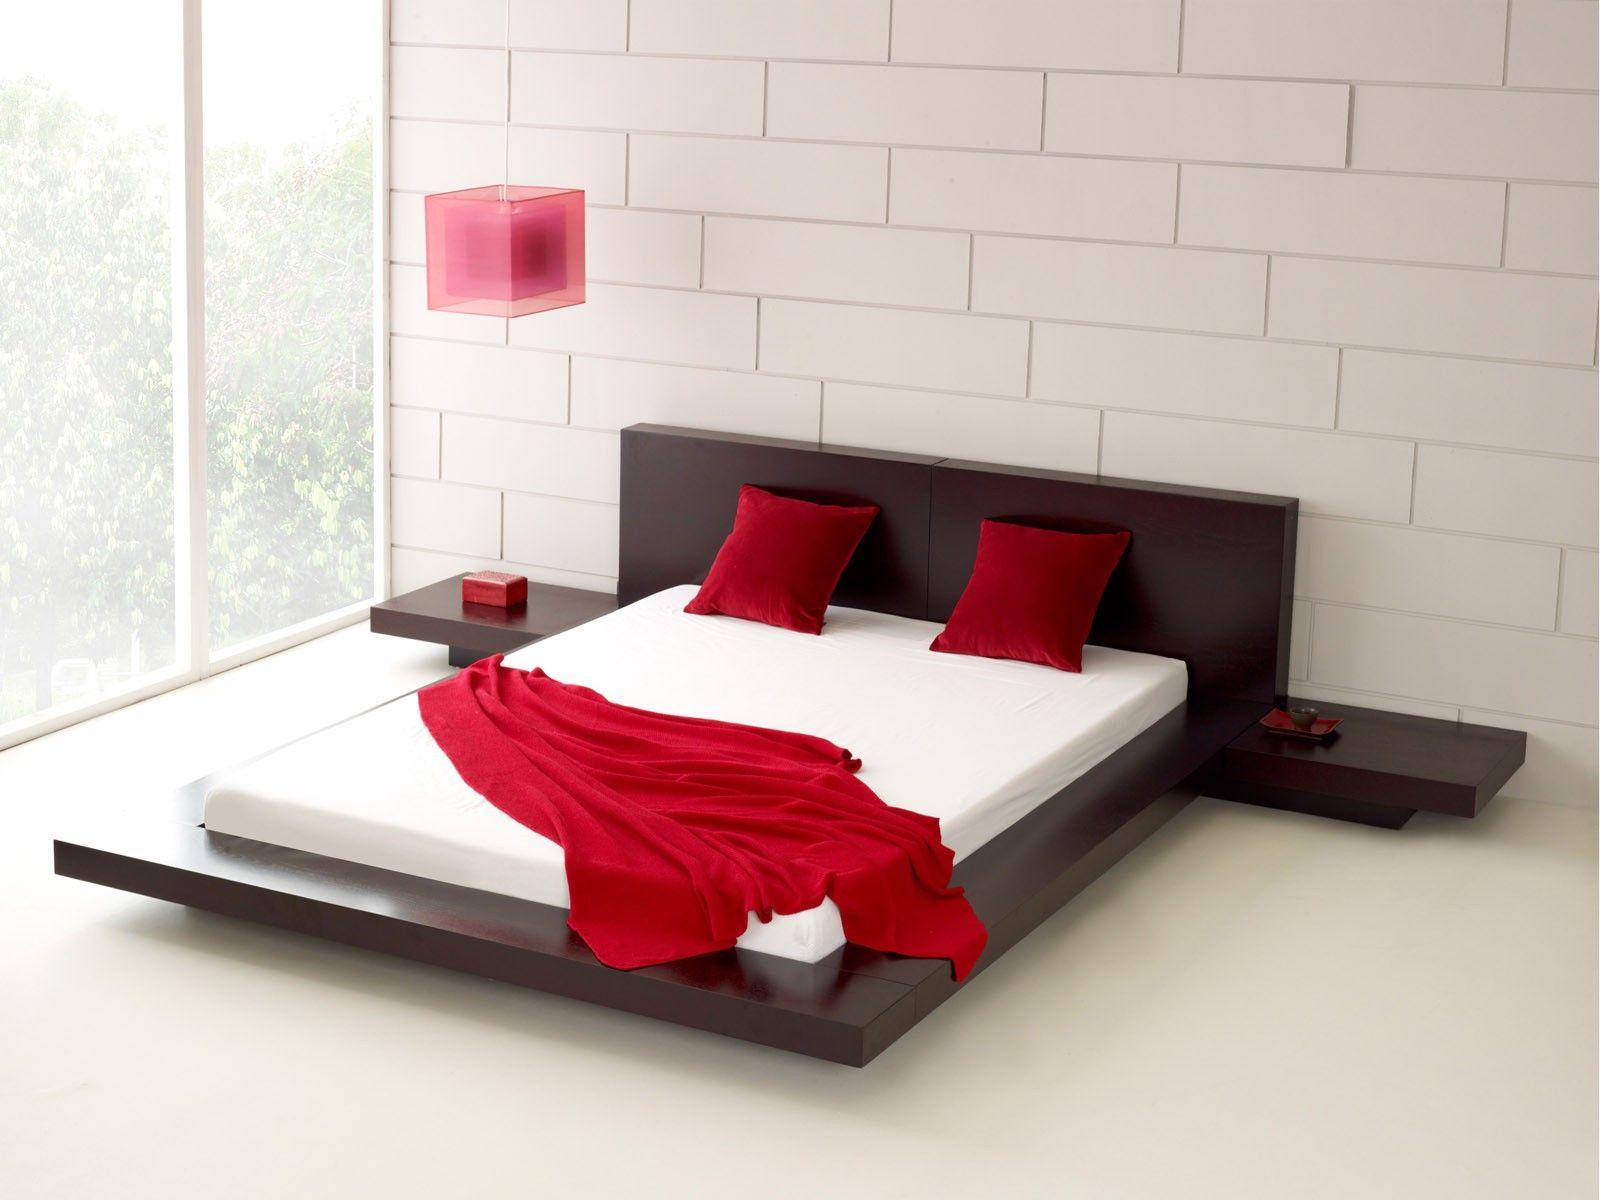 Interior Design   Room Interior Design   Kitchen Interior design ... #bedroominterior - More room designs at Stylendesigns.com